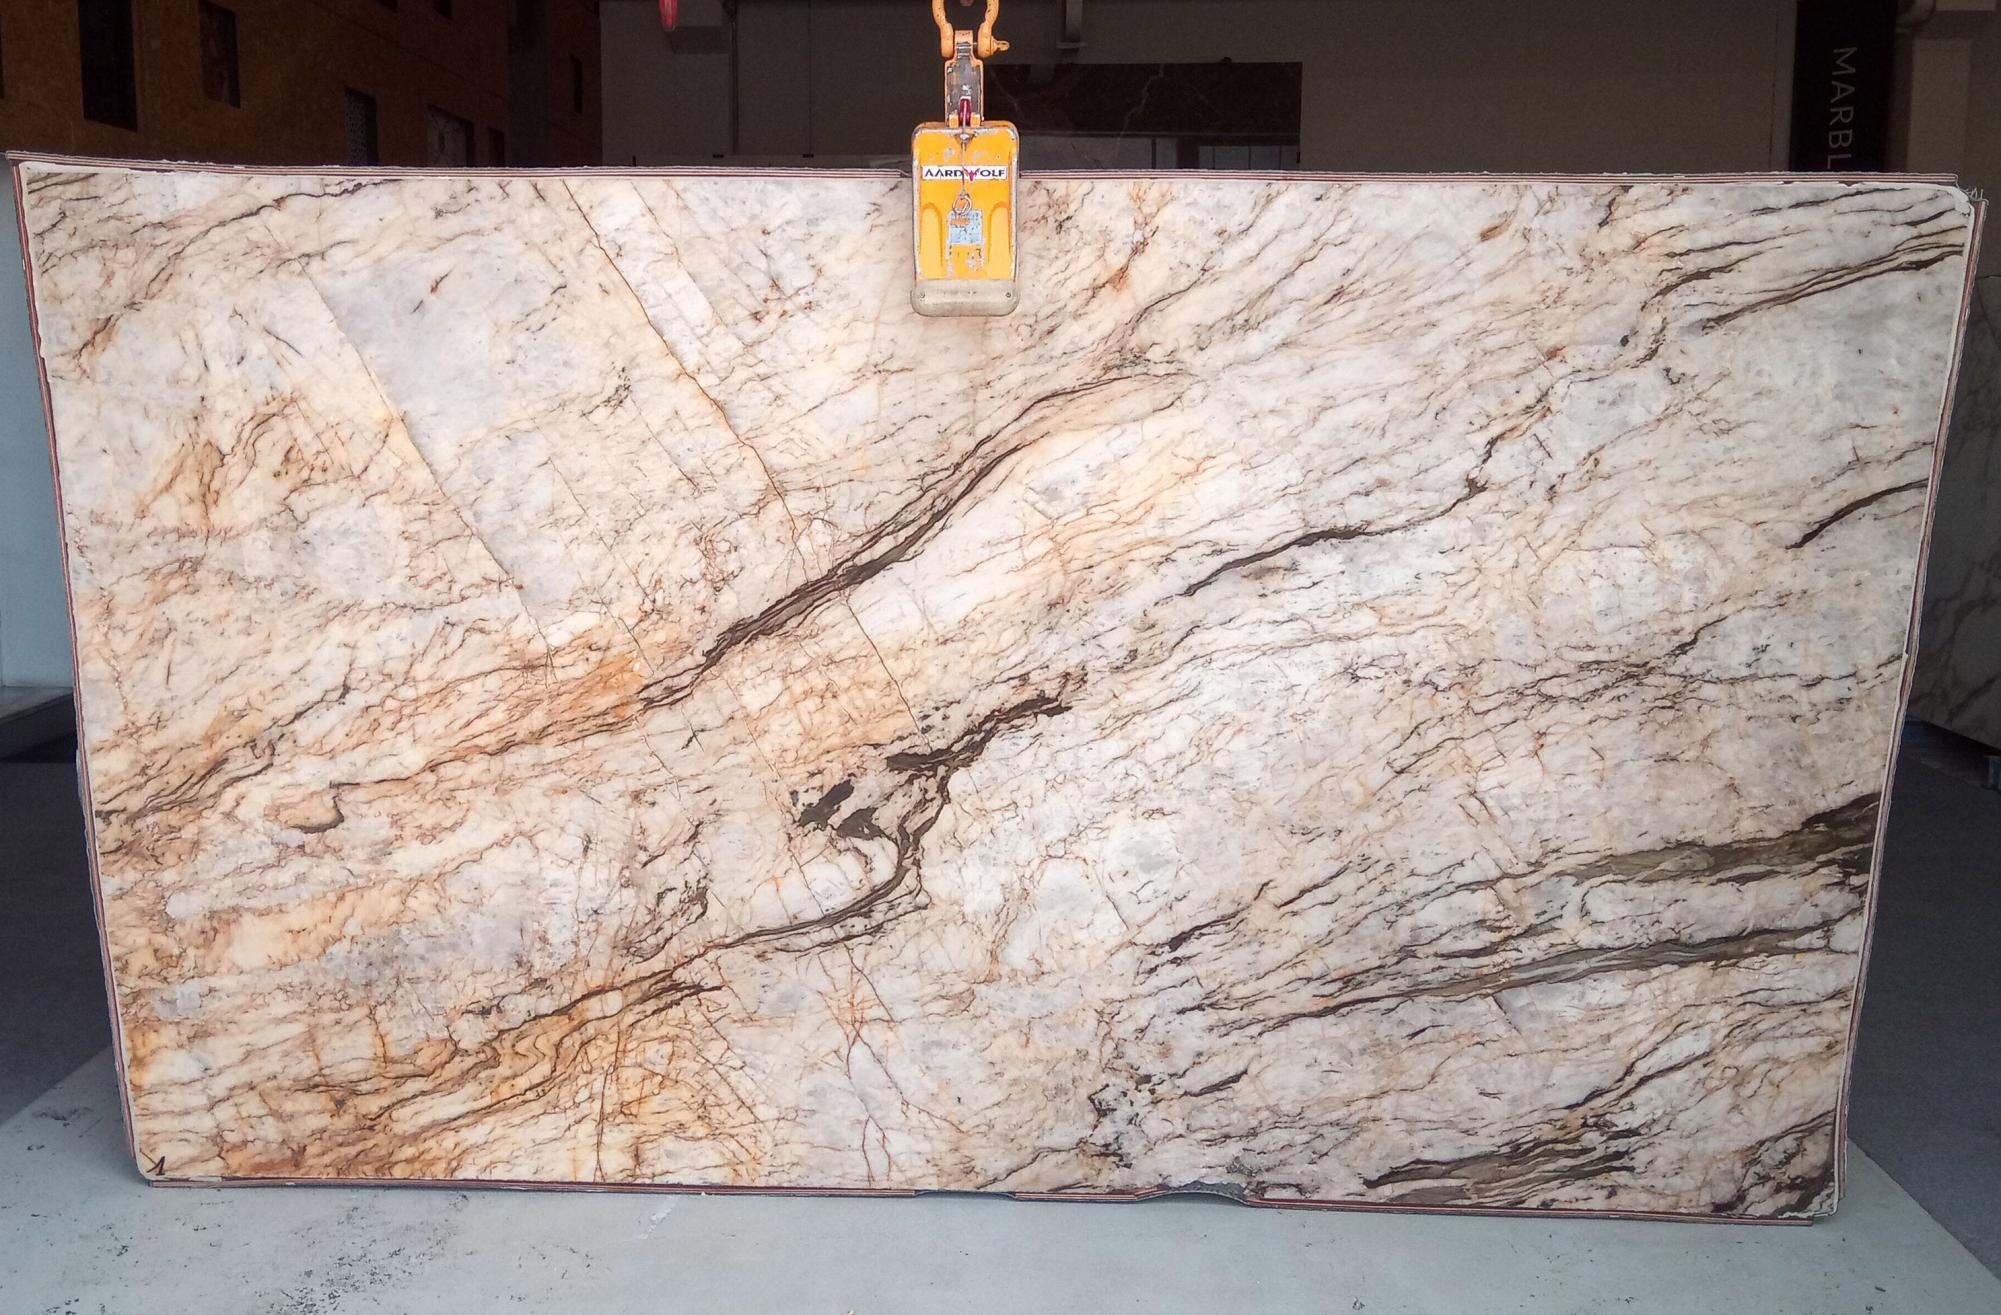 TEMPEST CRISTALLO Suministro Veneto (Italia) de planchas pulidas en cuarcita natural A0111 , SL2CM